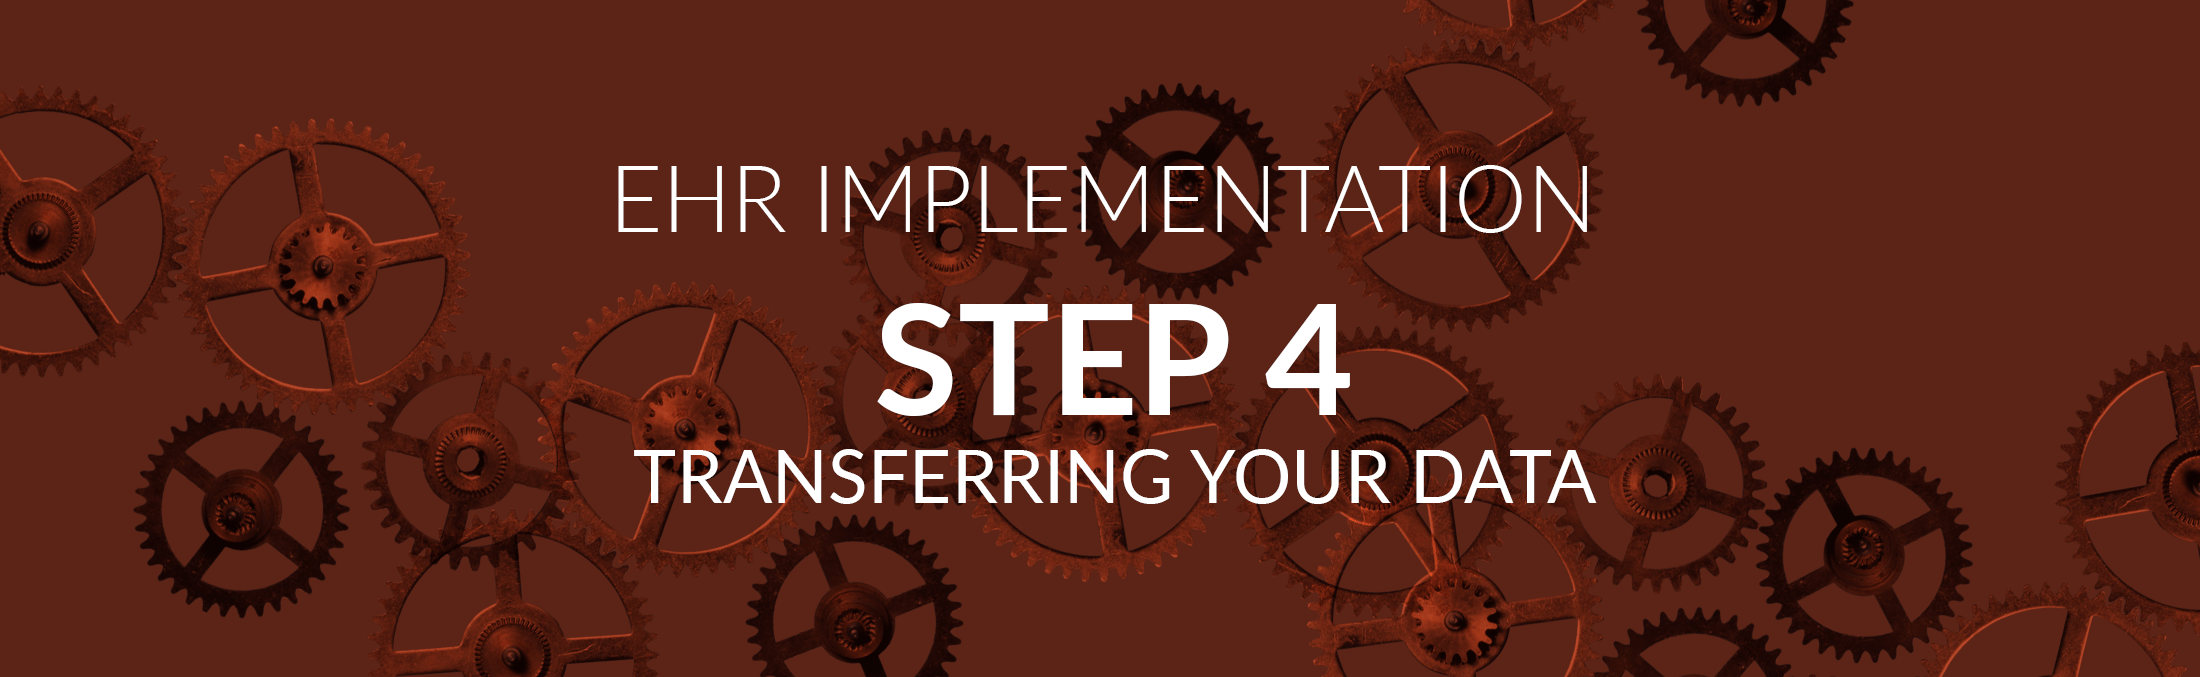 ehr implementation step 4